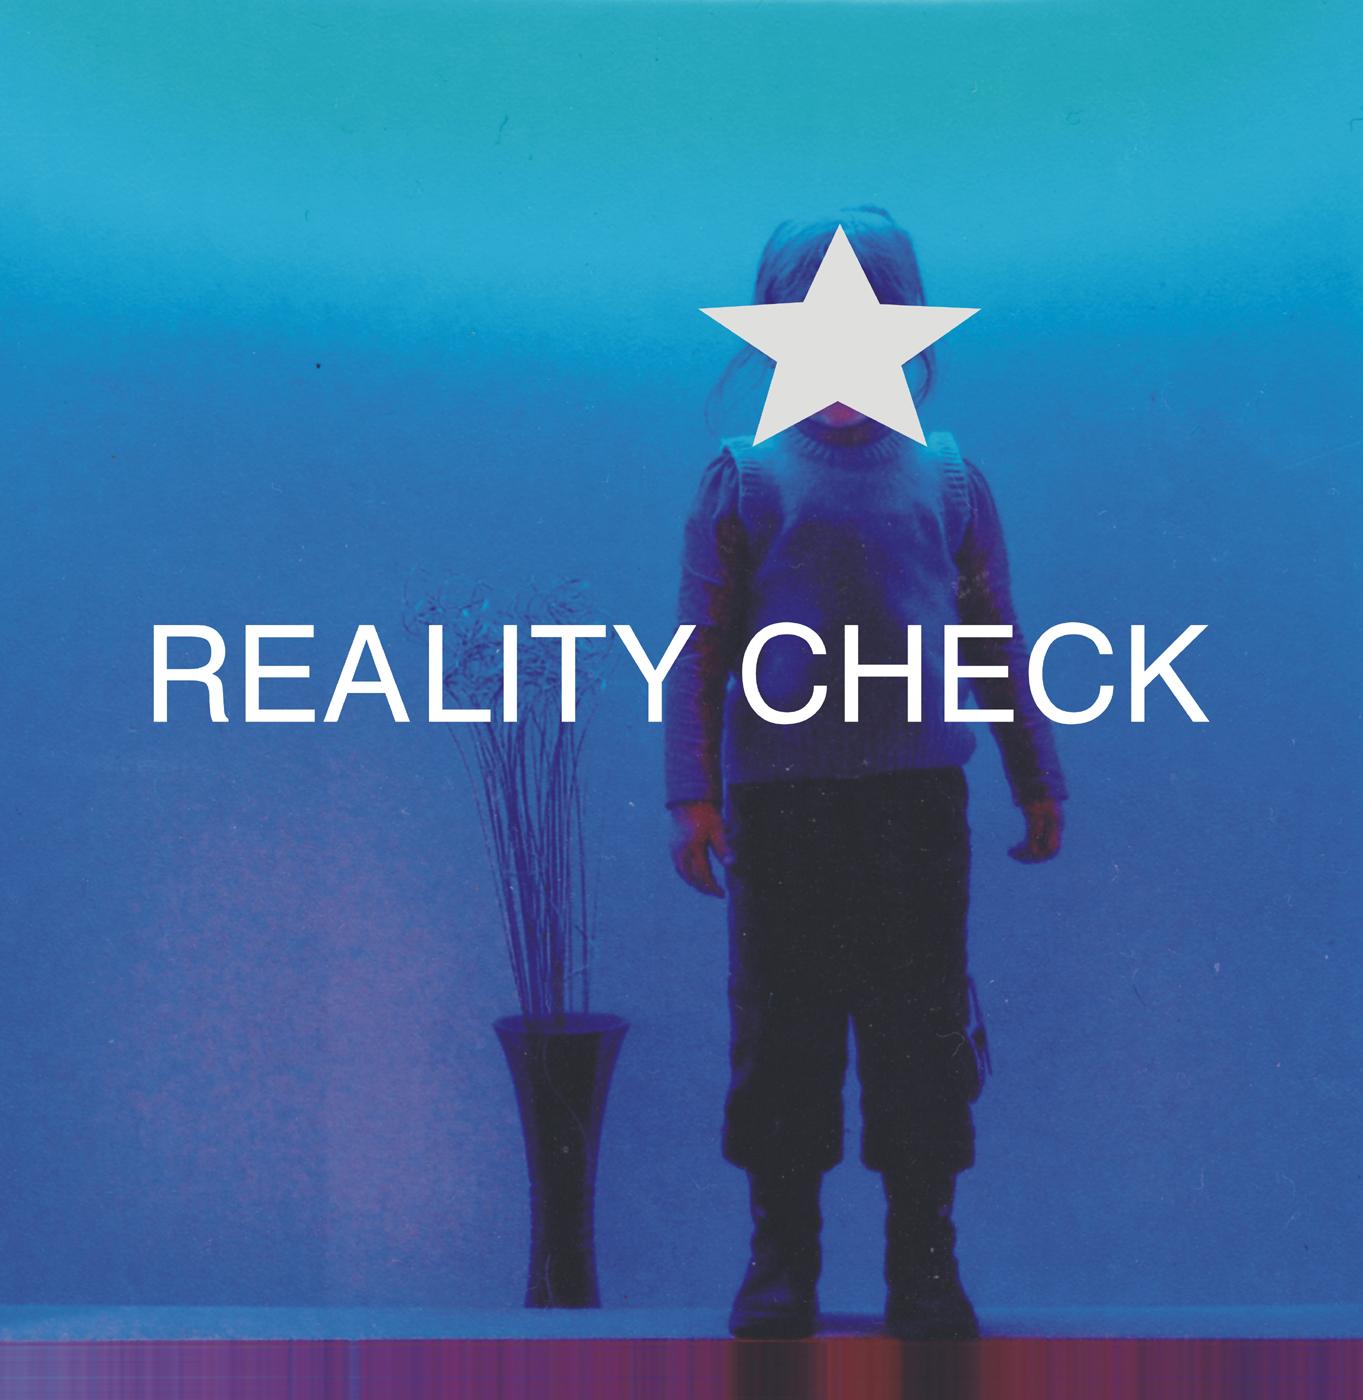 Reality chek: Someone